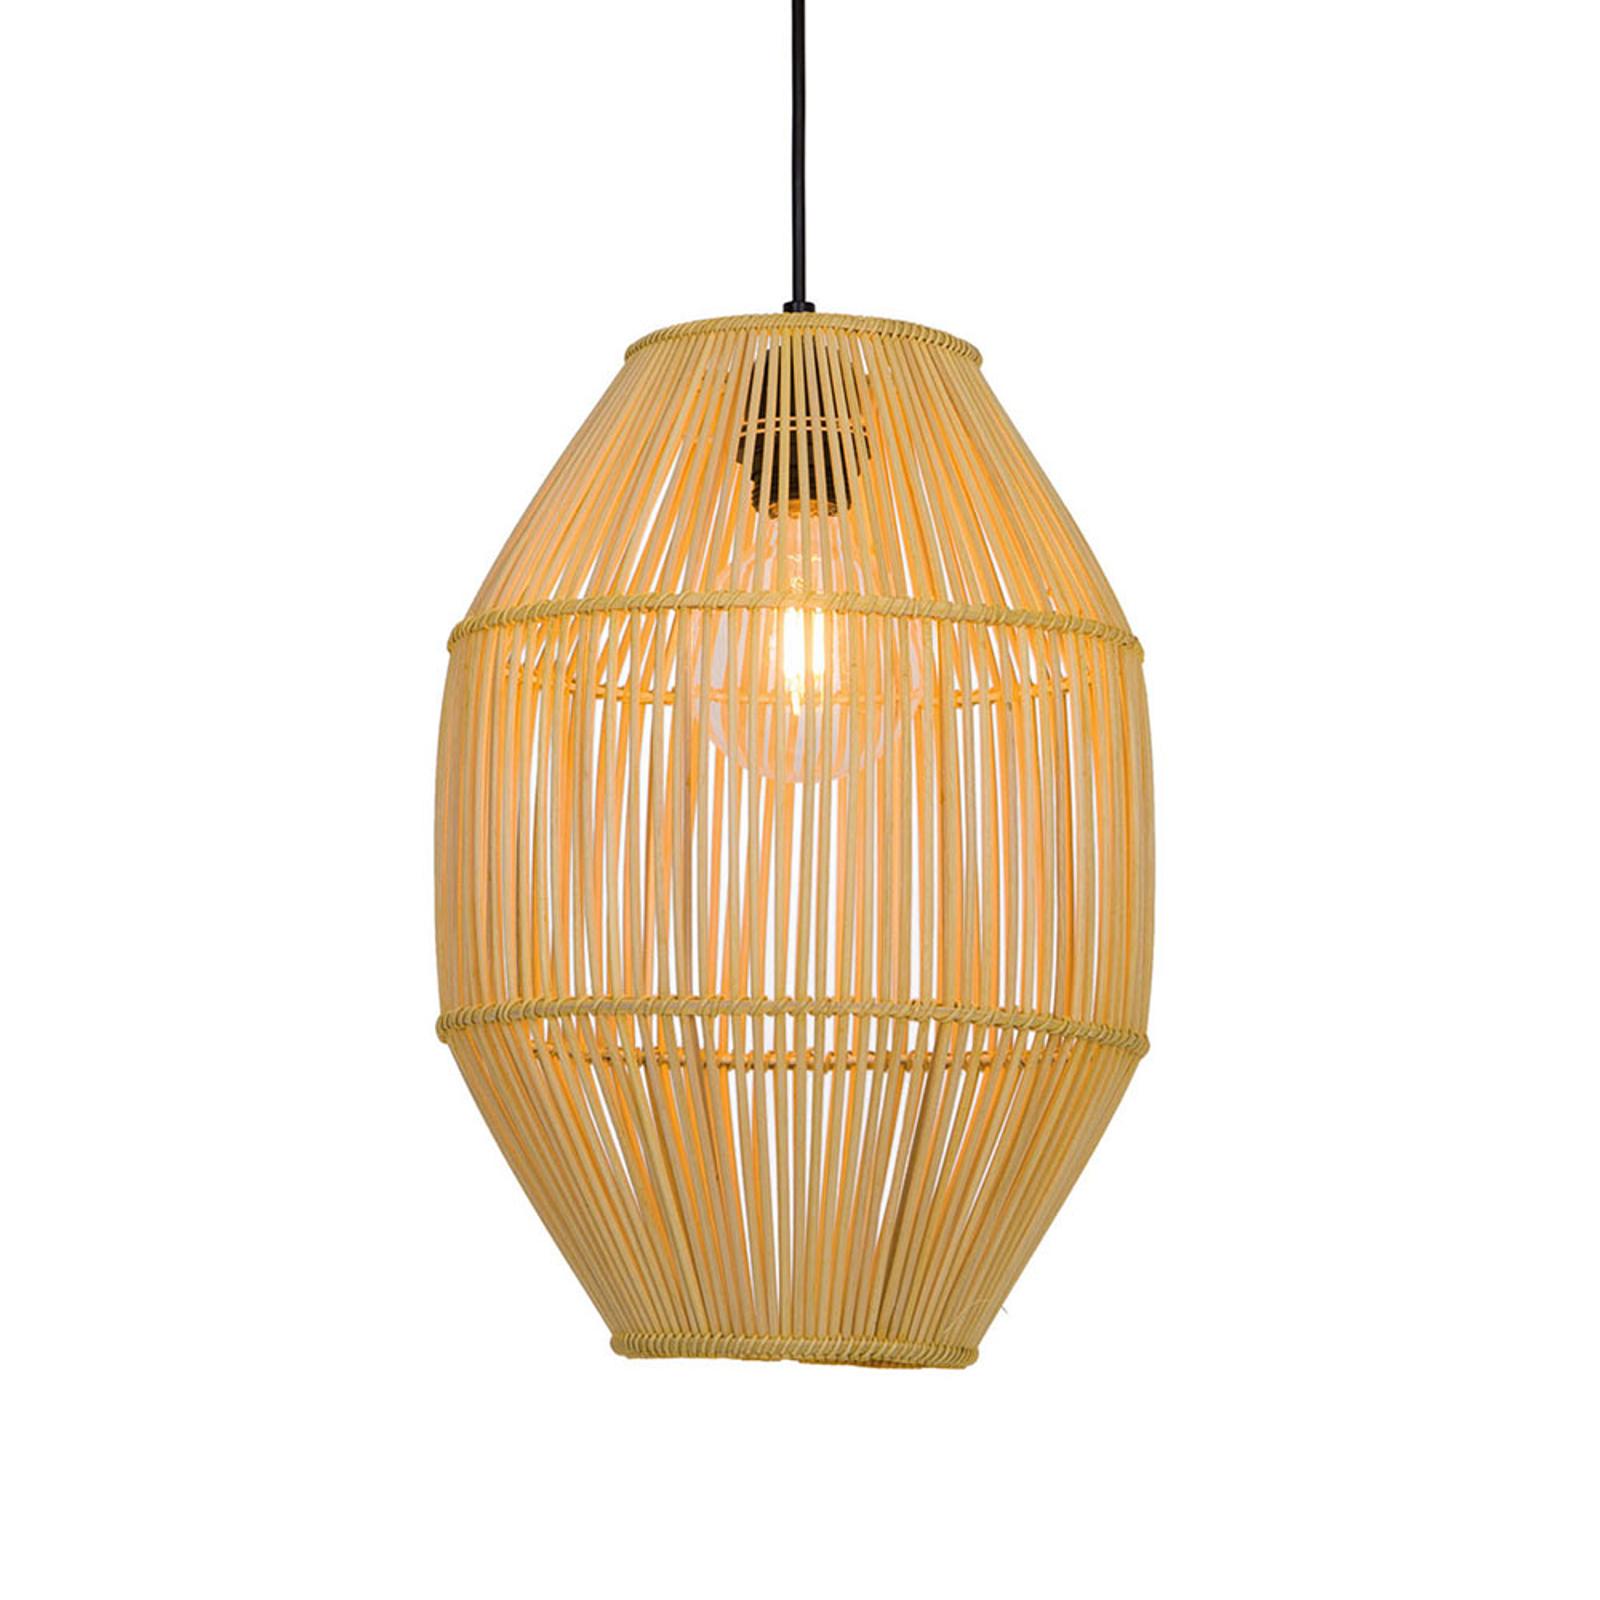 Hanglamp Anteo van rotan, hoog Oval